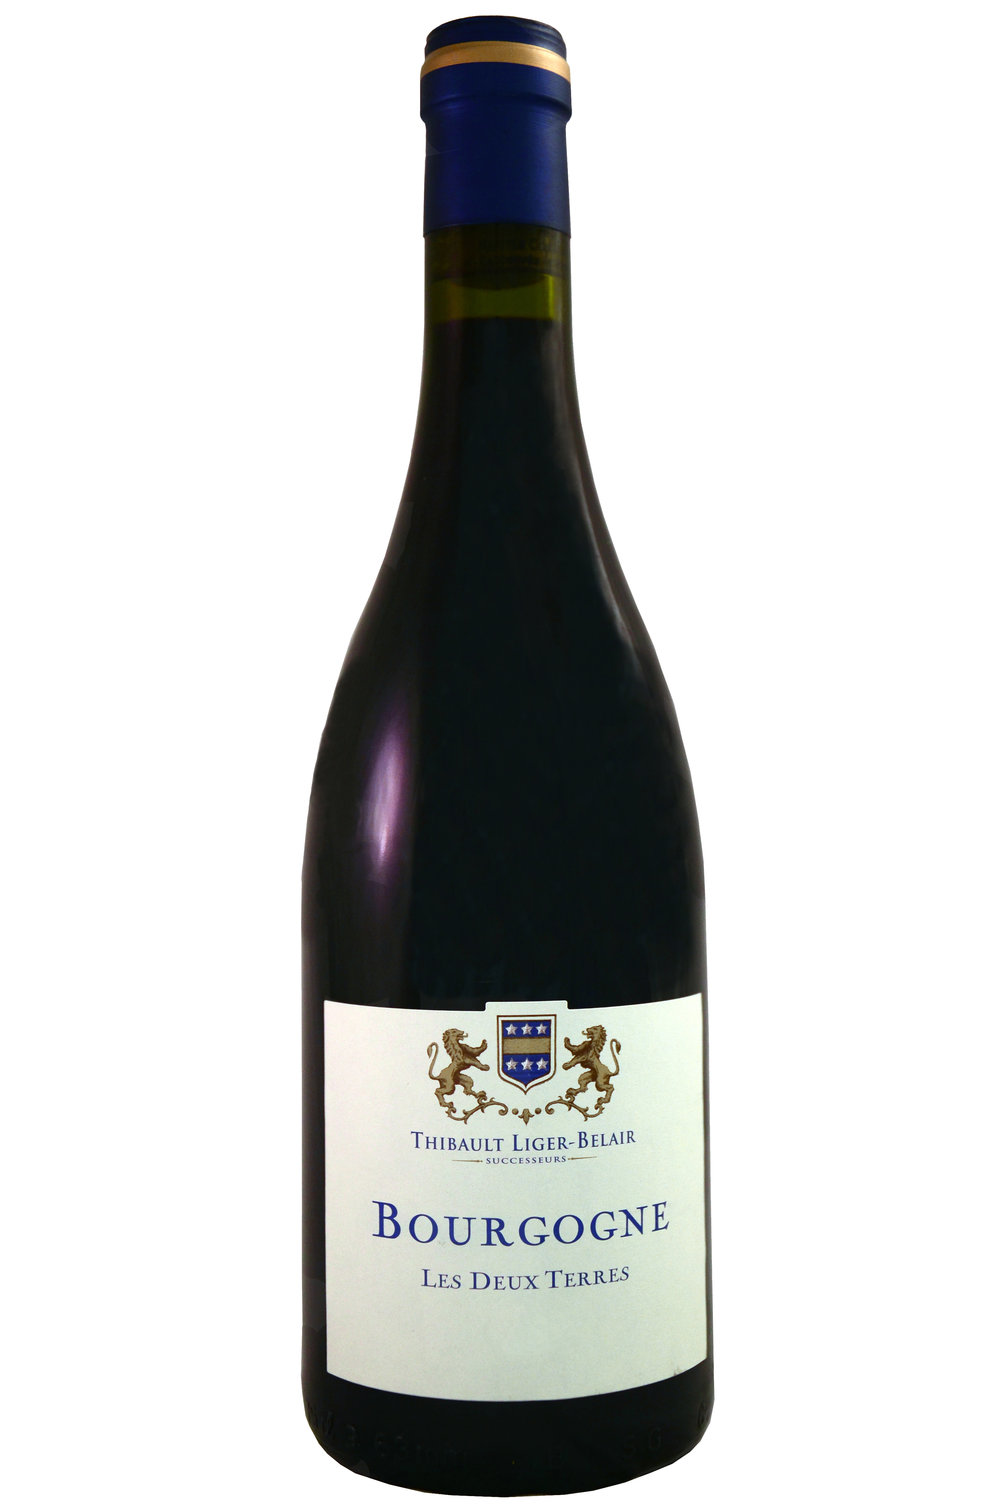 Liger-Belair Bourgogne Les Deux Terres Bottle.jpg